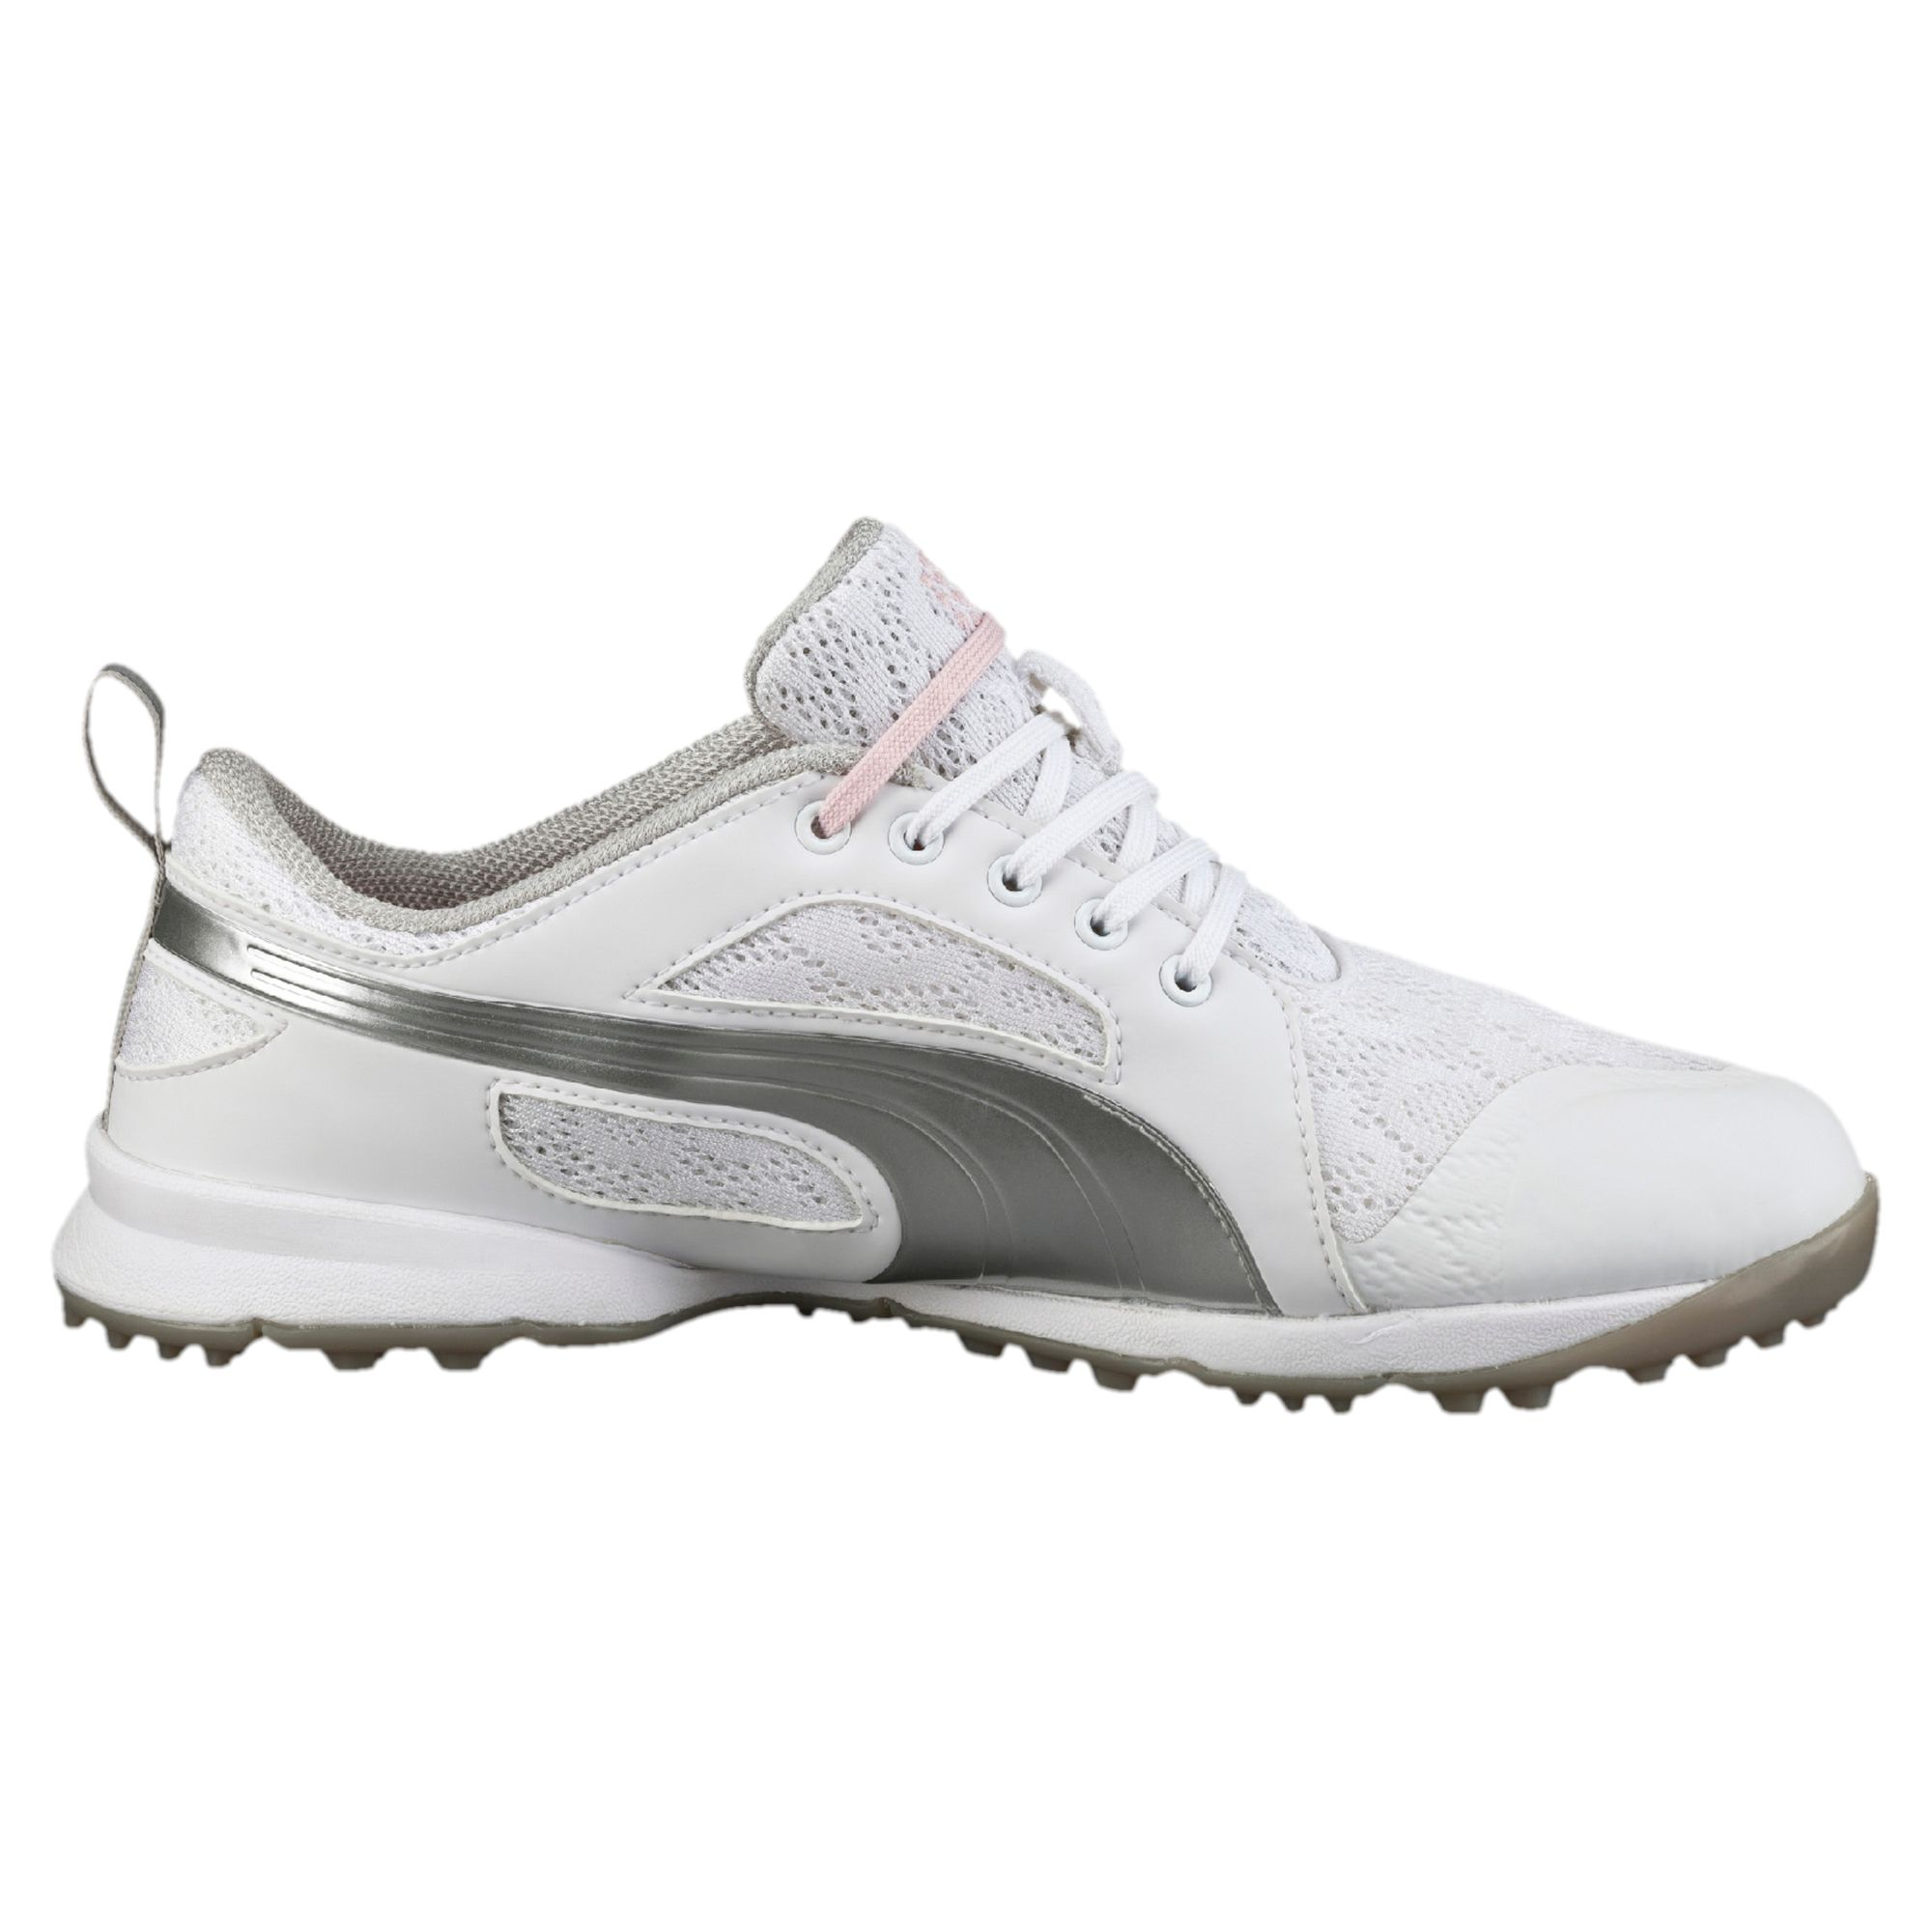 PUMA BioFly Mesh Women s Golf Shoes Golf Low Boot Female New  30e279e01